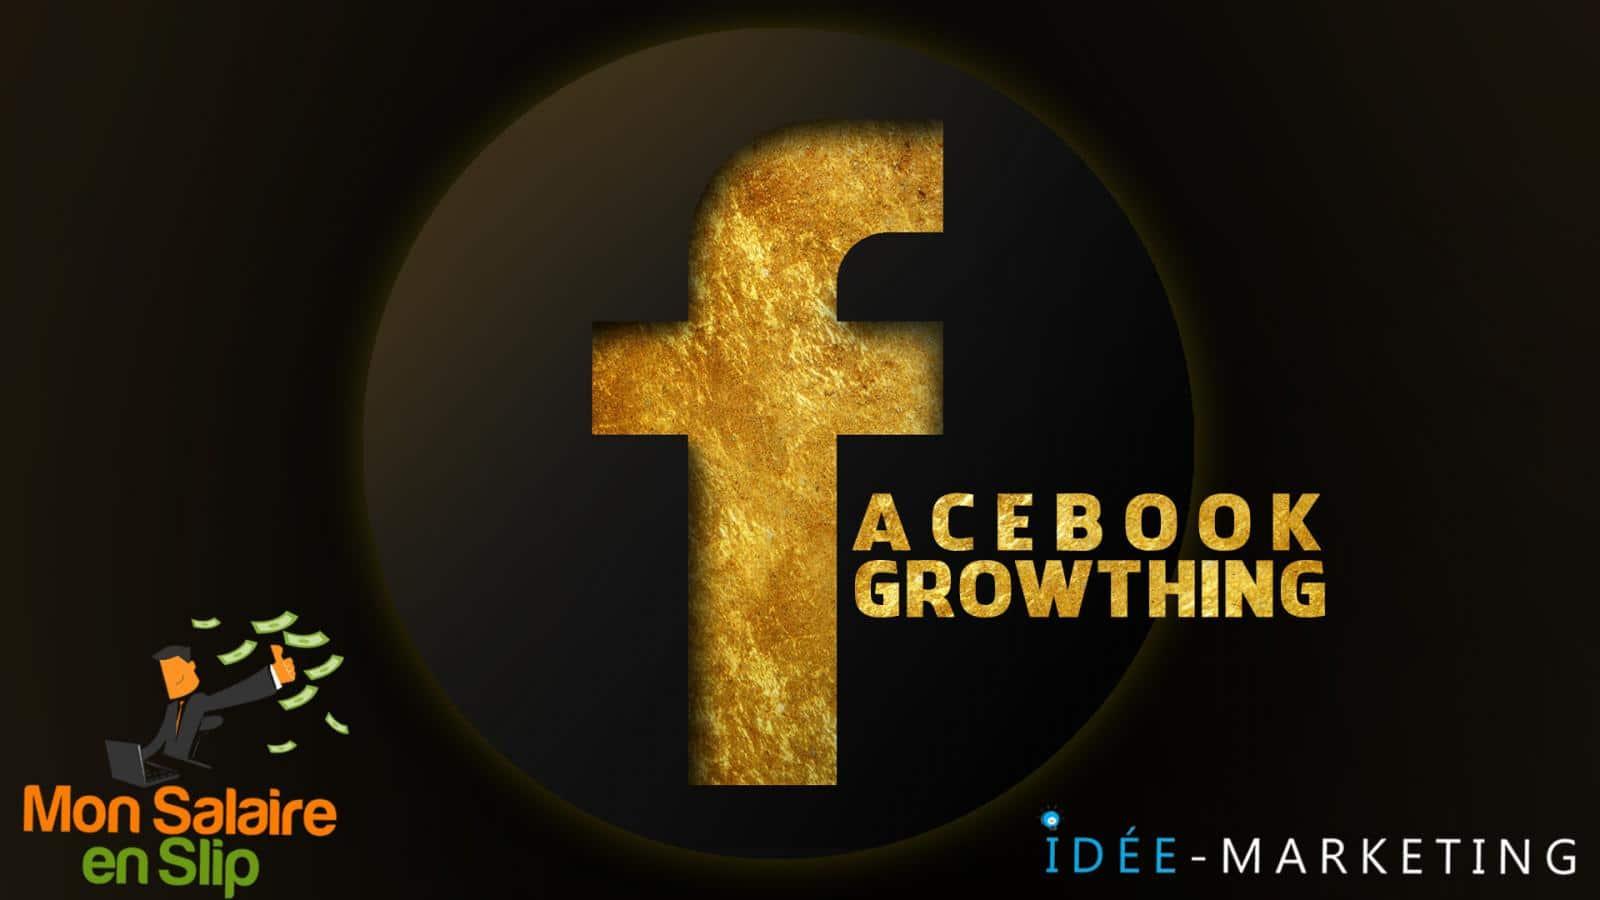 Formation Facebook Growthing Mon salaire en slip idee marketing fred zibette jean luc monteagudo